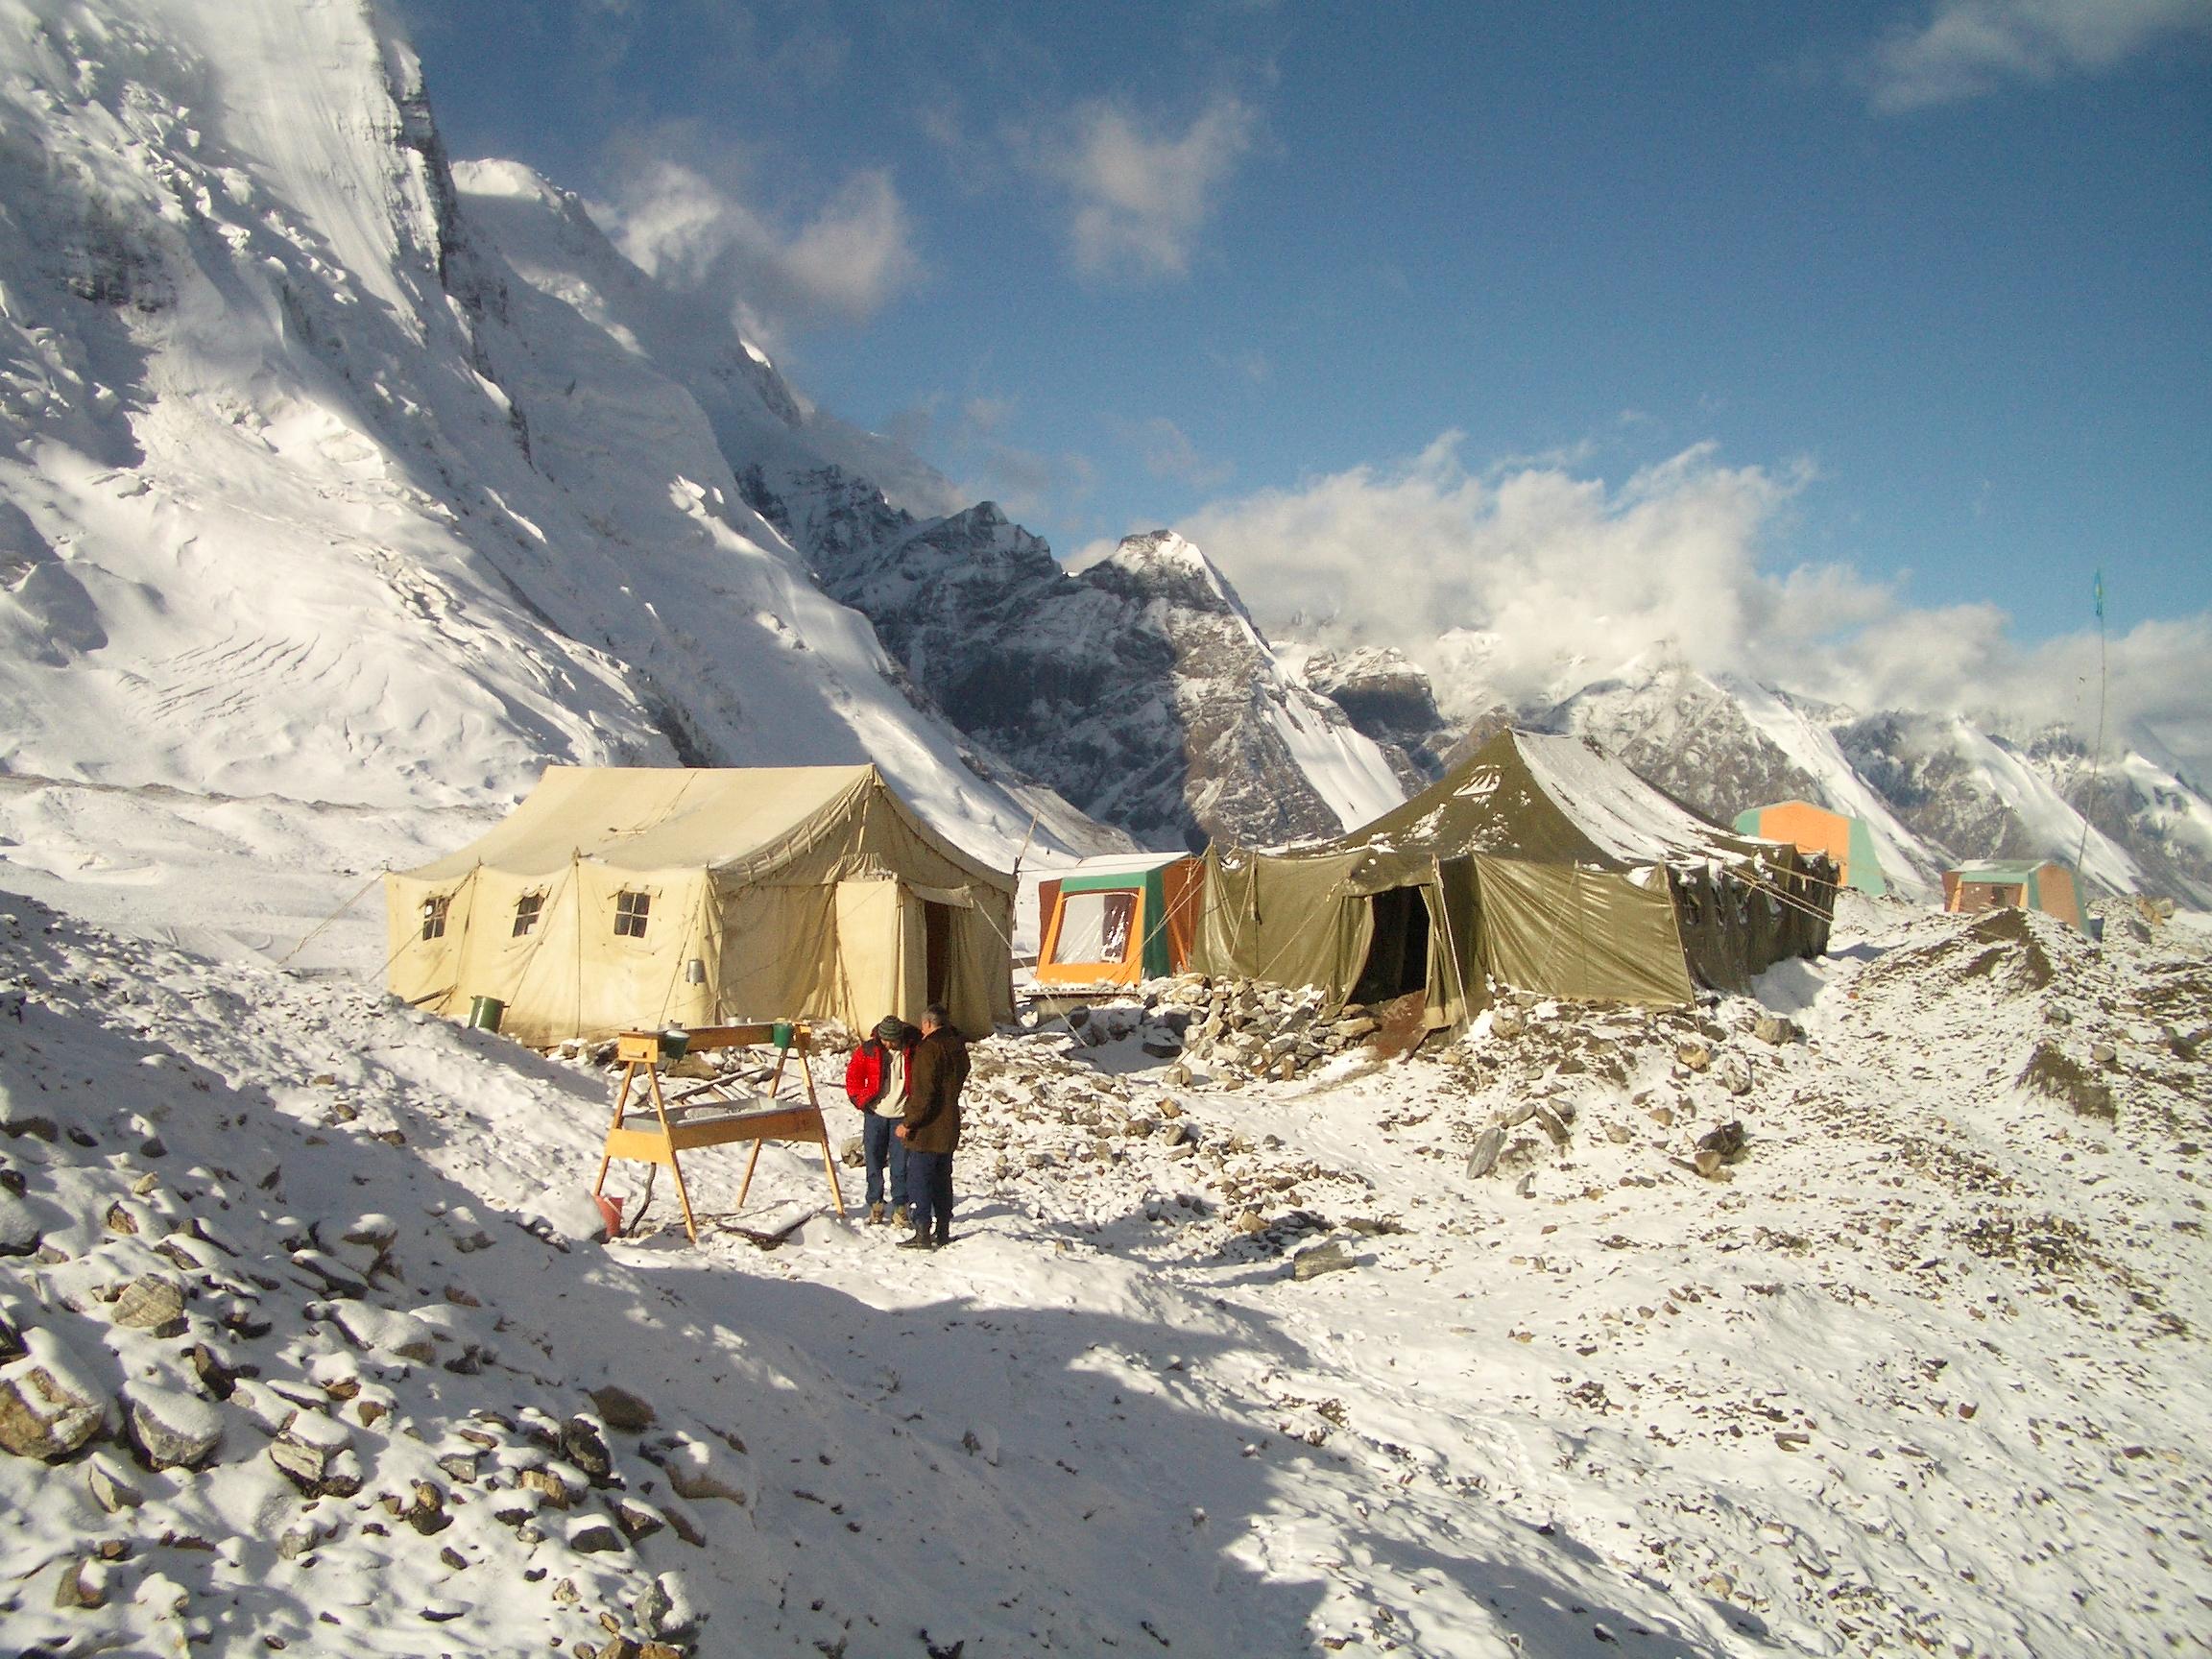 The setup at basecamp, Khan Tengri